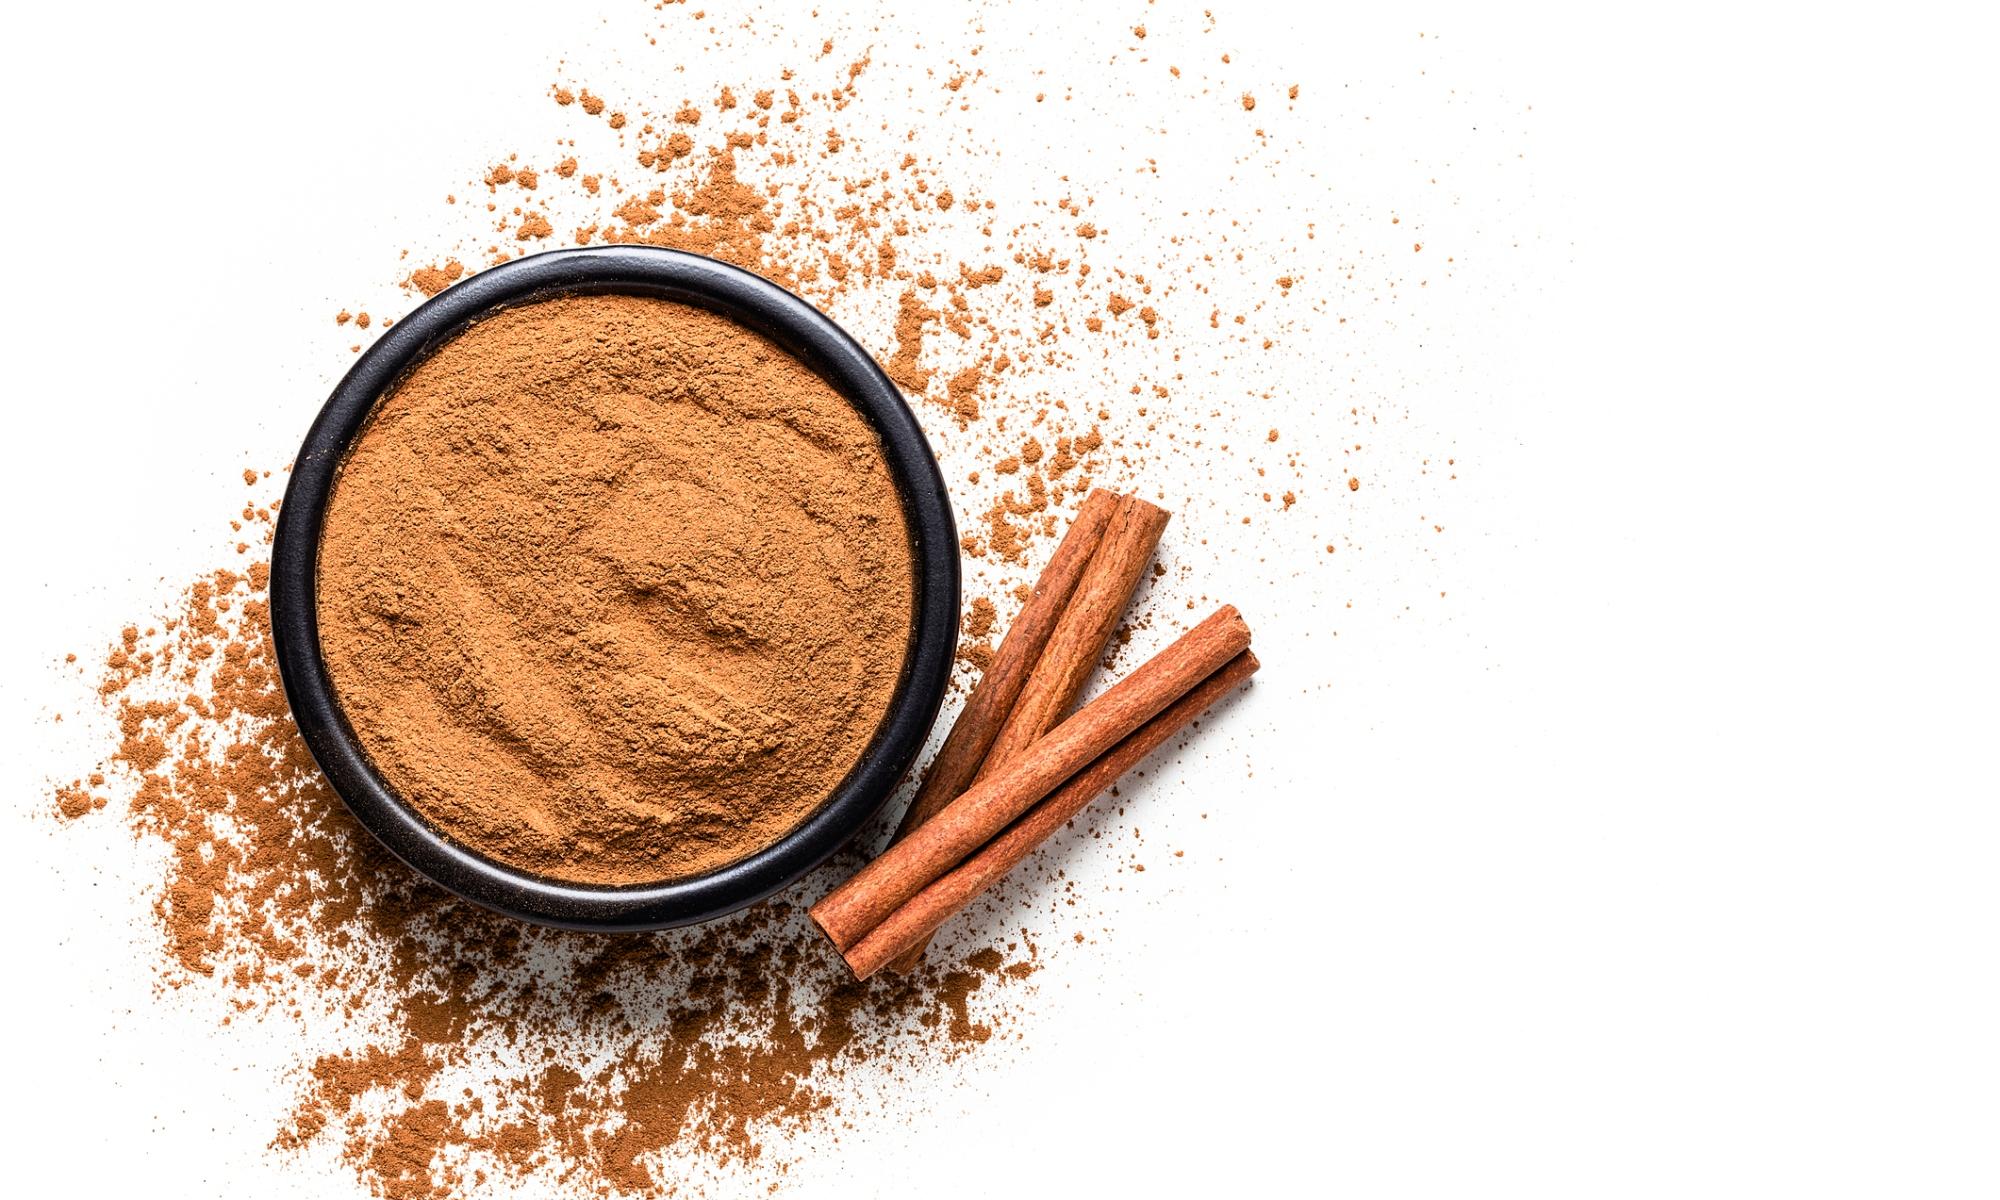 cinnamon sticks powder